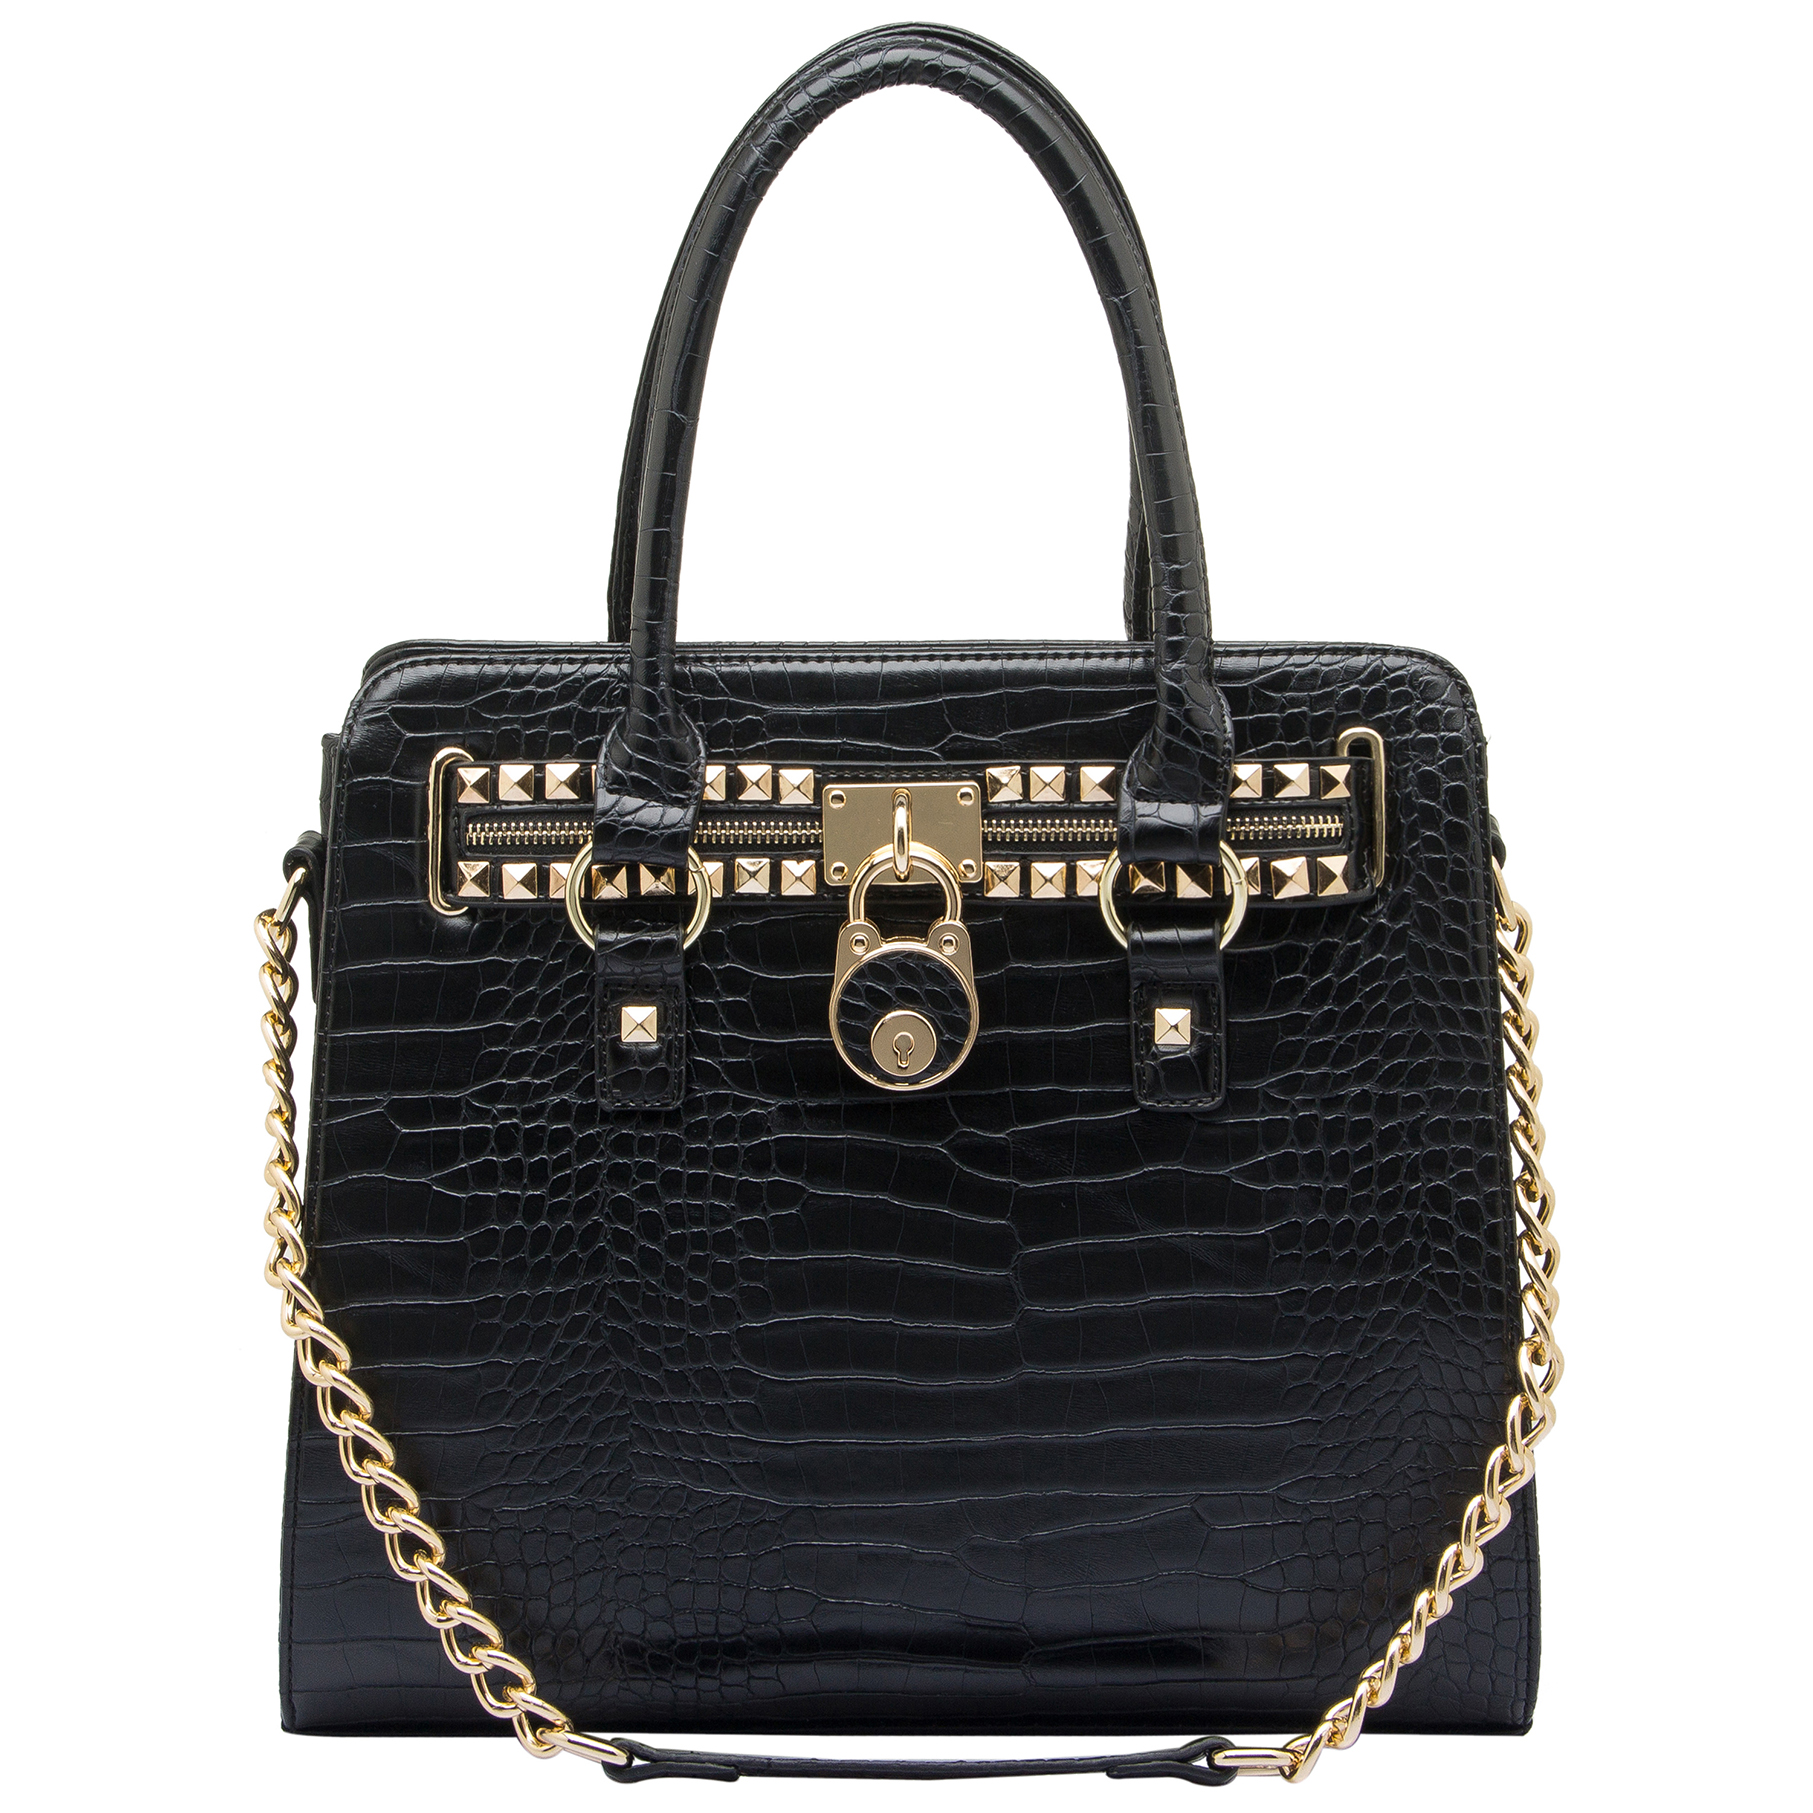 HALEY Black Crocodile Bowler Style Handbag Front